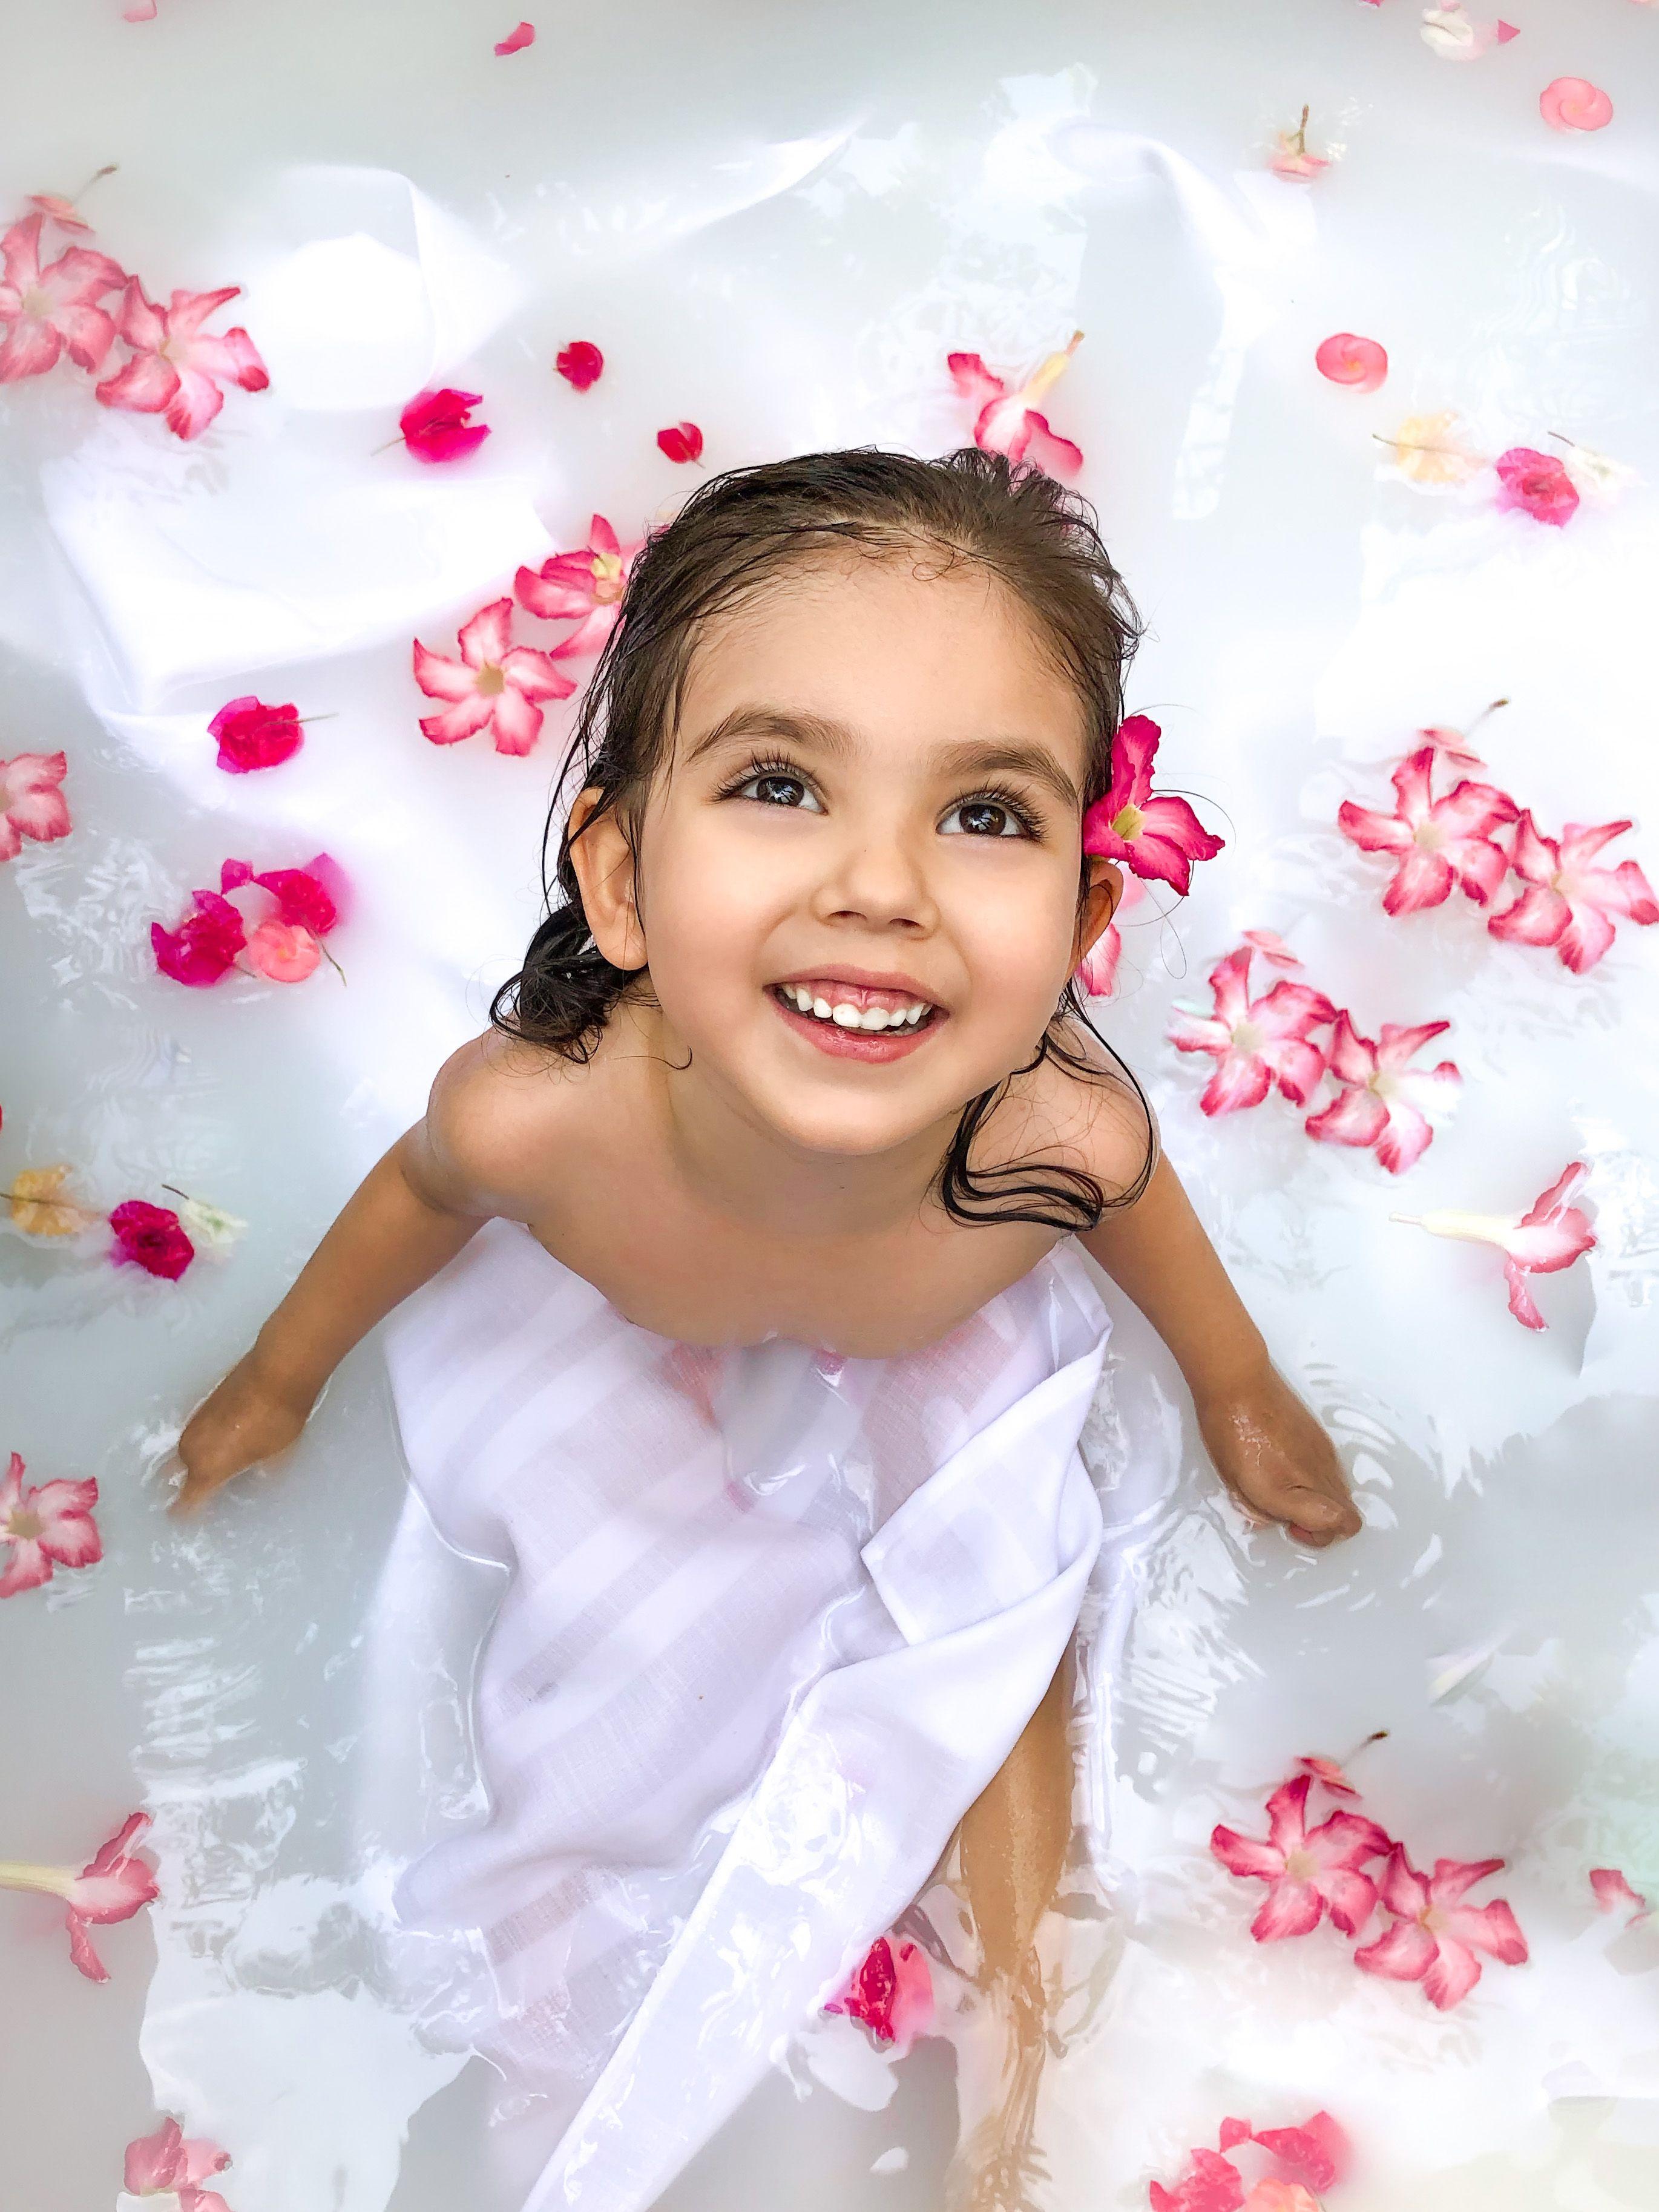 #girlshoot #flowers #flowershoot #kidsposes #kidshoots